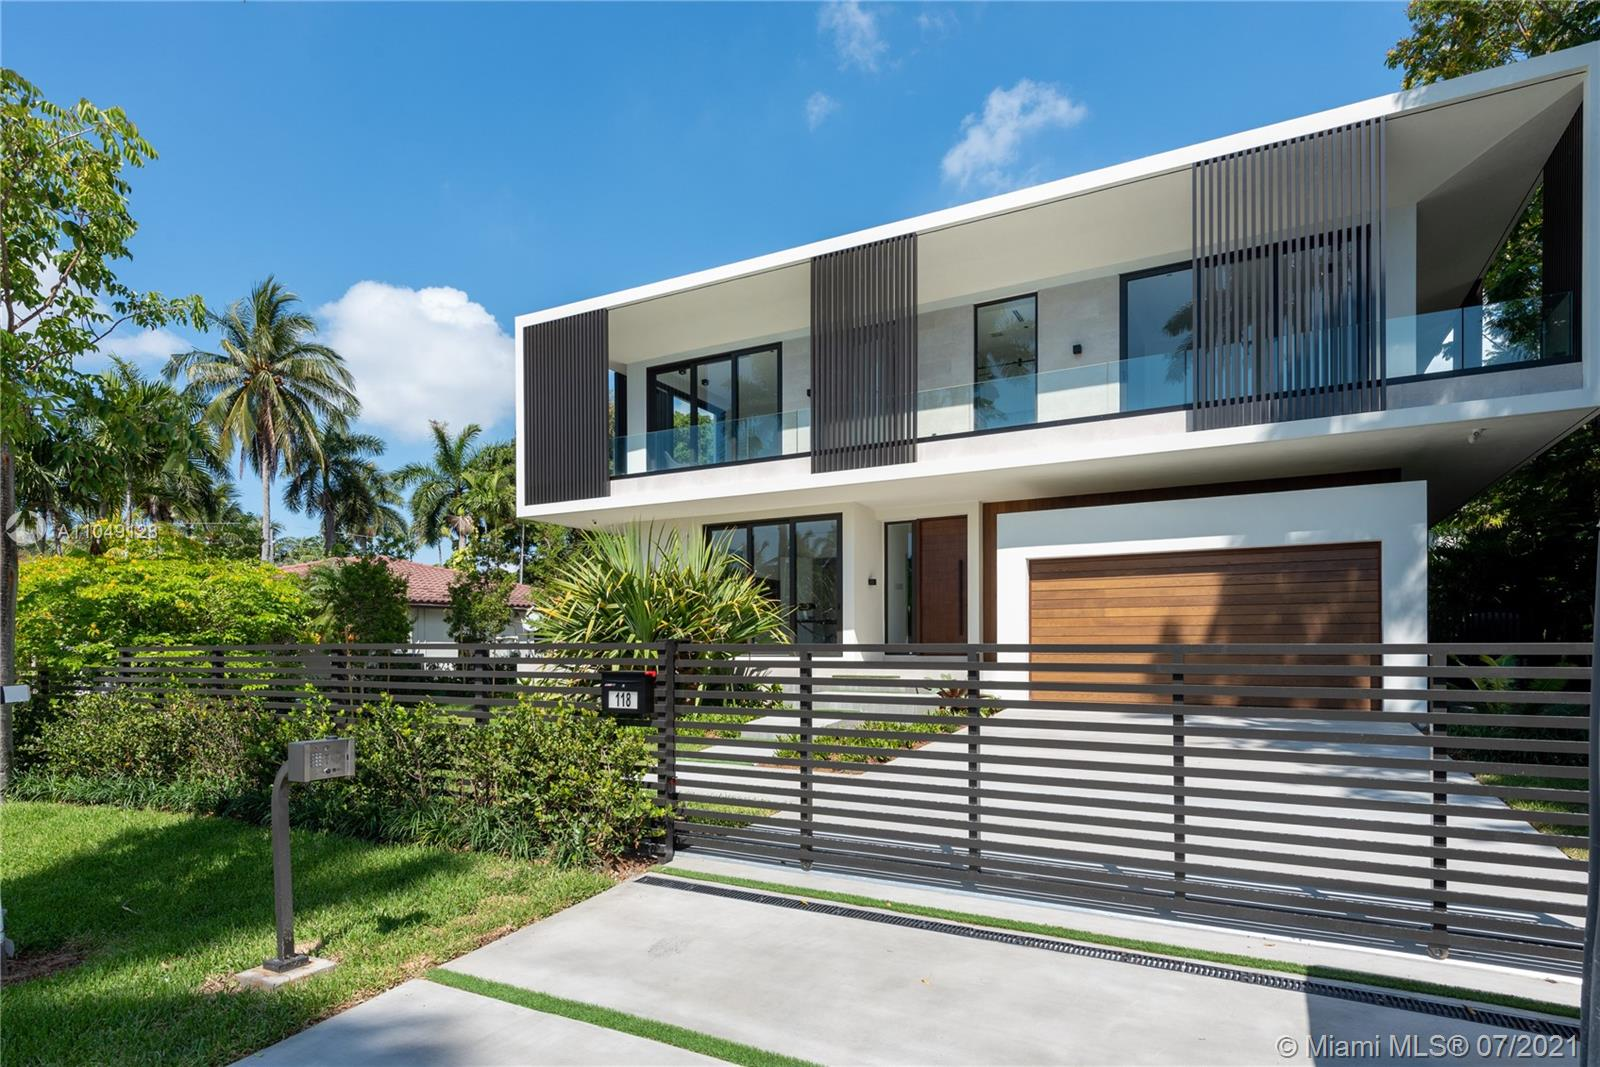 Hibiscus Island - 118 W 4th Ct, Miami Beach, FL 33139